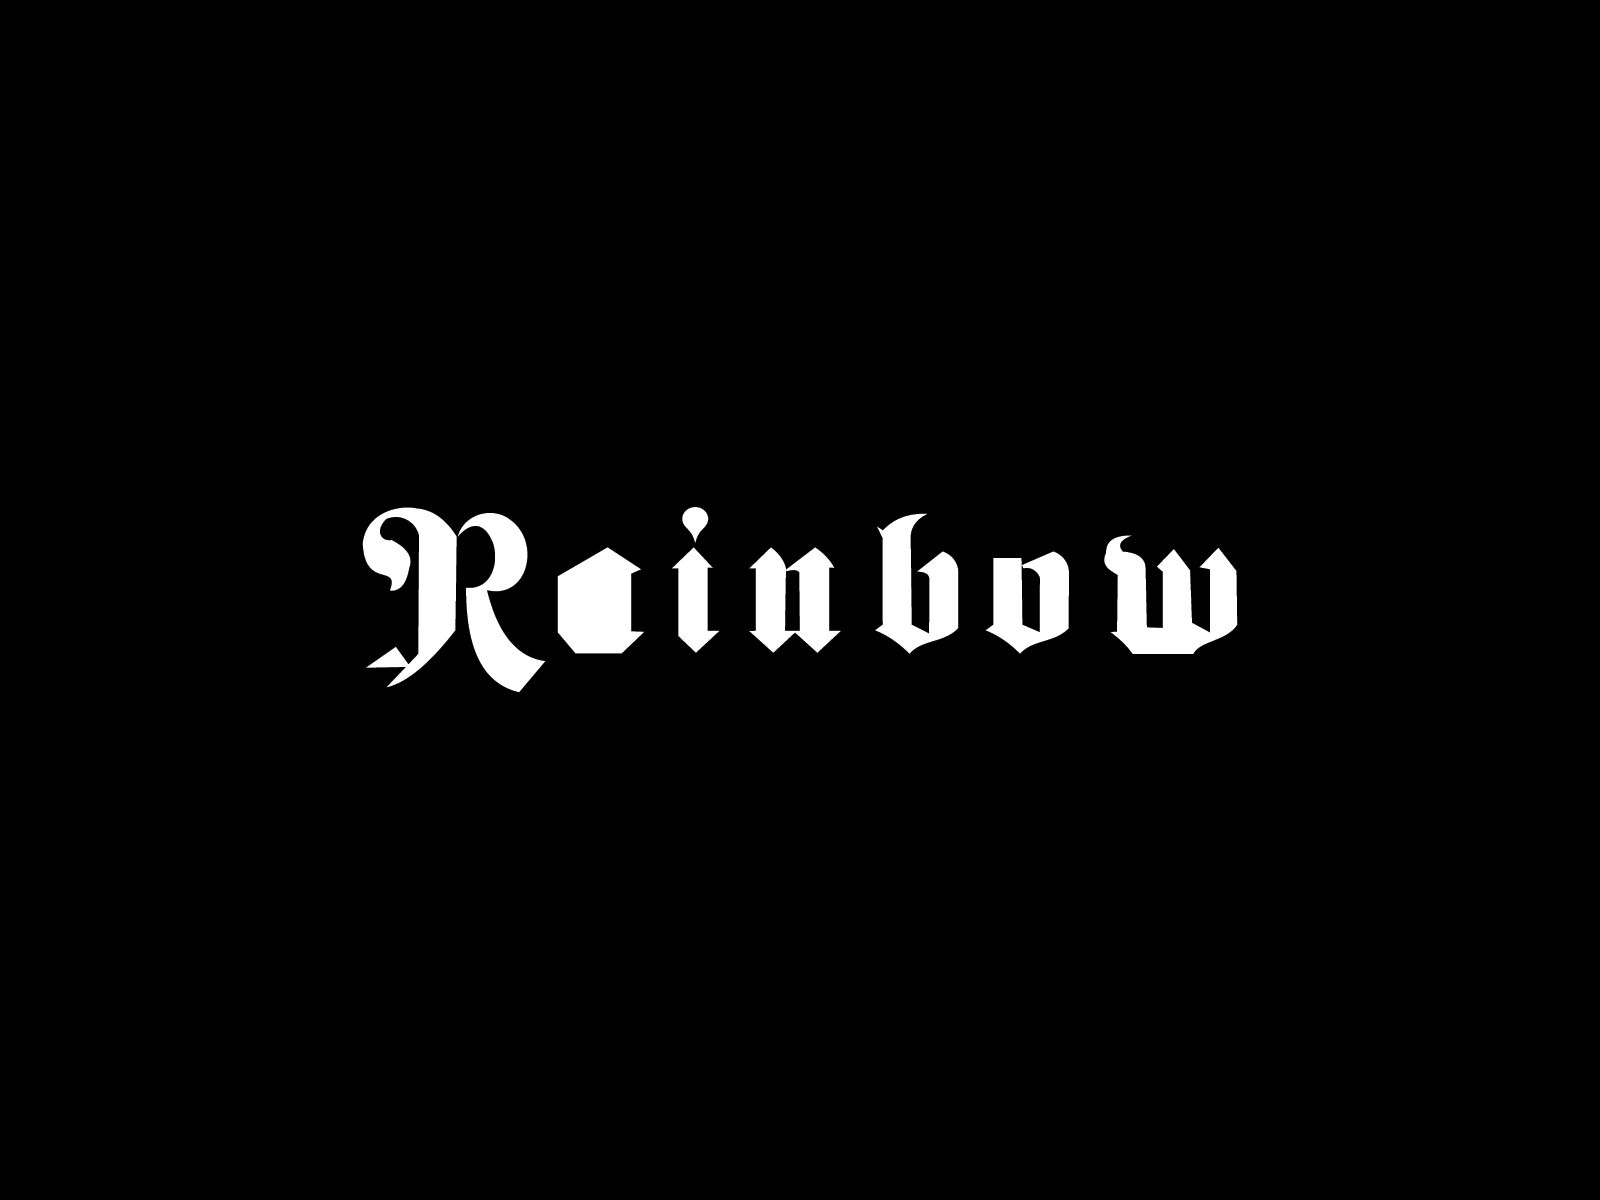 The animals band logo scorpions band logo - Rainbow Band Logo And Wallpaper